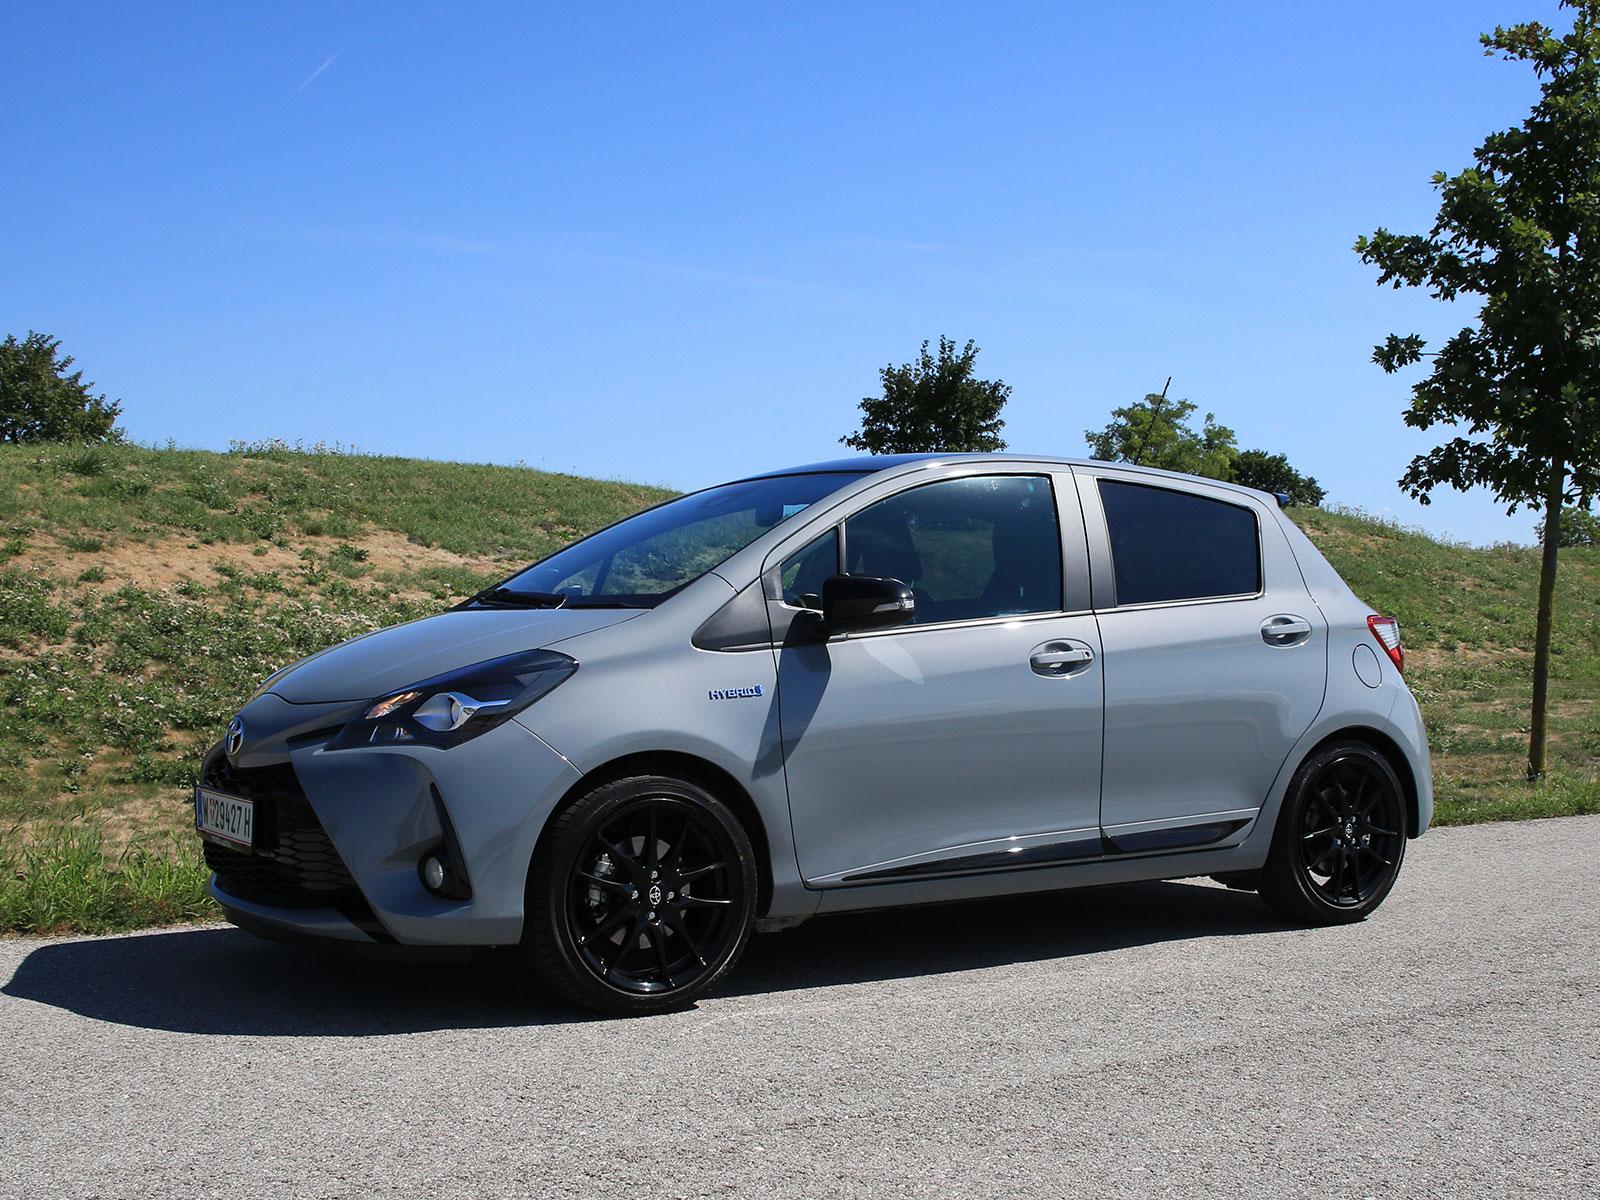 Toyota Yaris 1,5 VVT-i Hybrid GR-S (c) Stefan Gruber